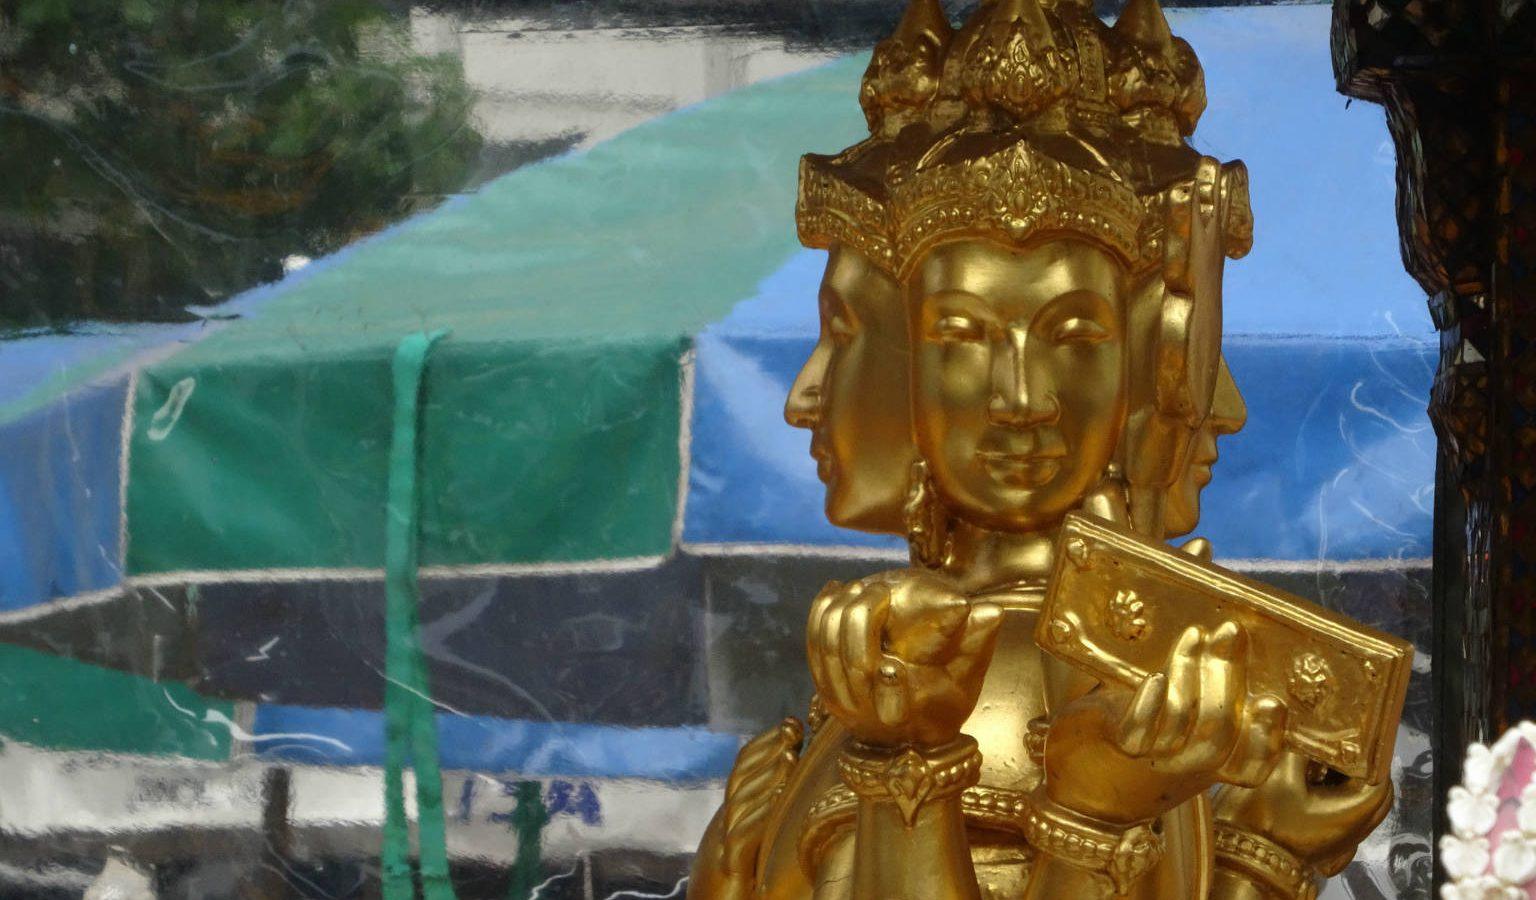 Het beeld van Phra Phrom in de Erawan Shrine in Bangkok, Thailand